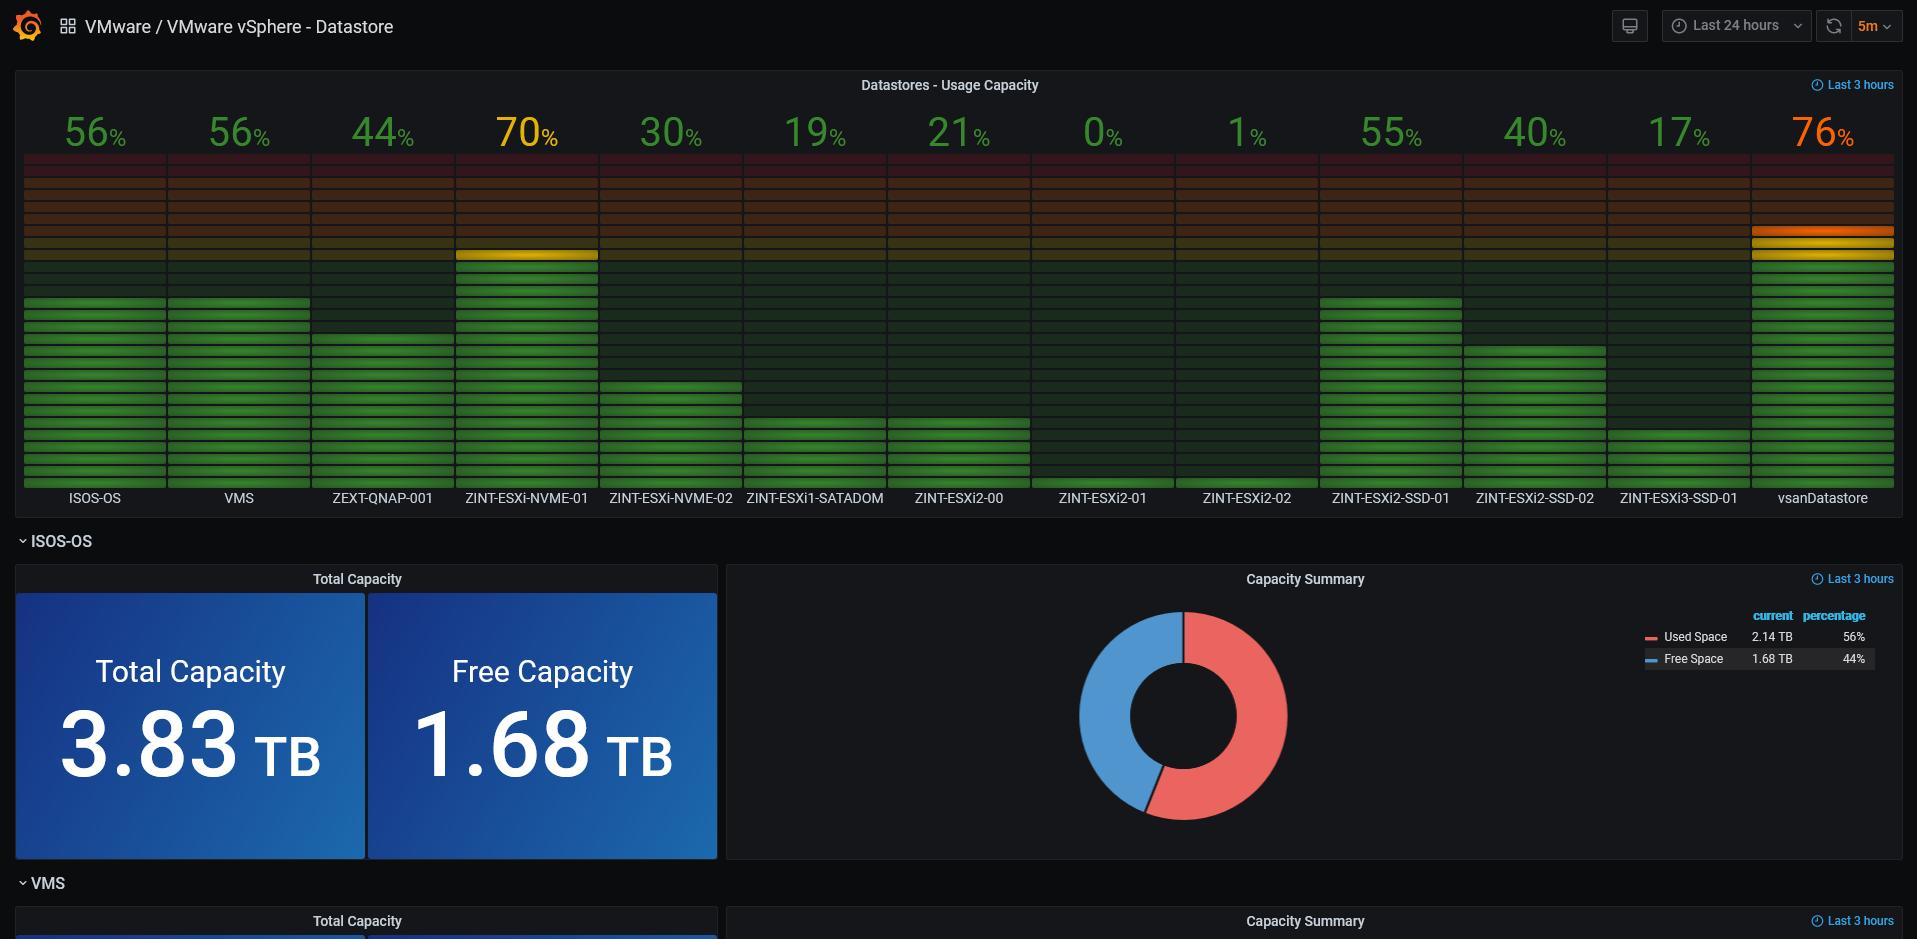 VMware vSphere Datastores Dashboard